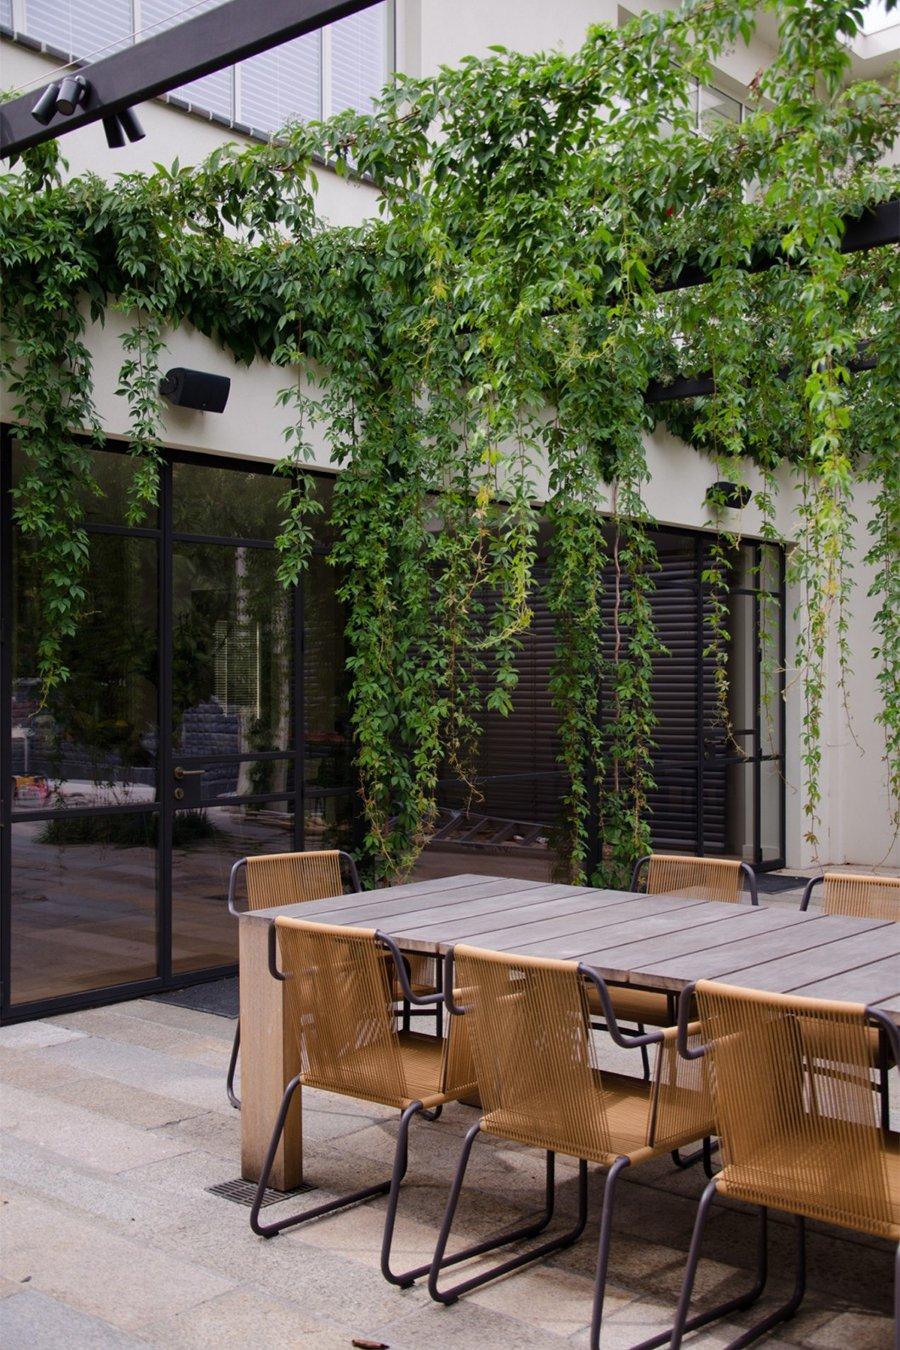 Outdoor Living - Dreamy Pergola Ideas for Our Deck